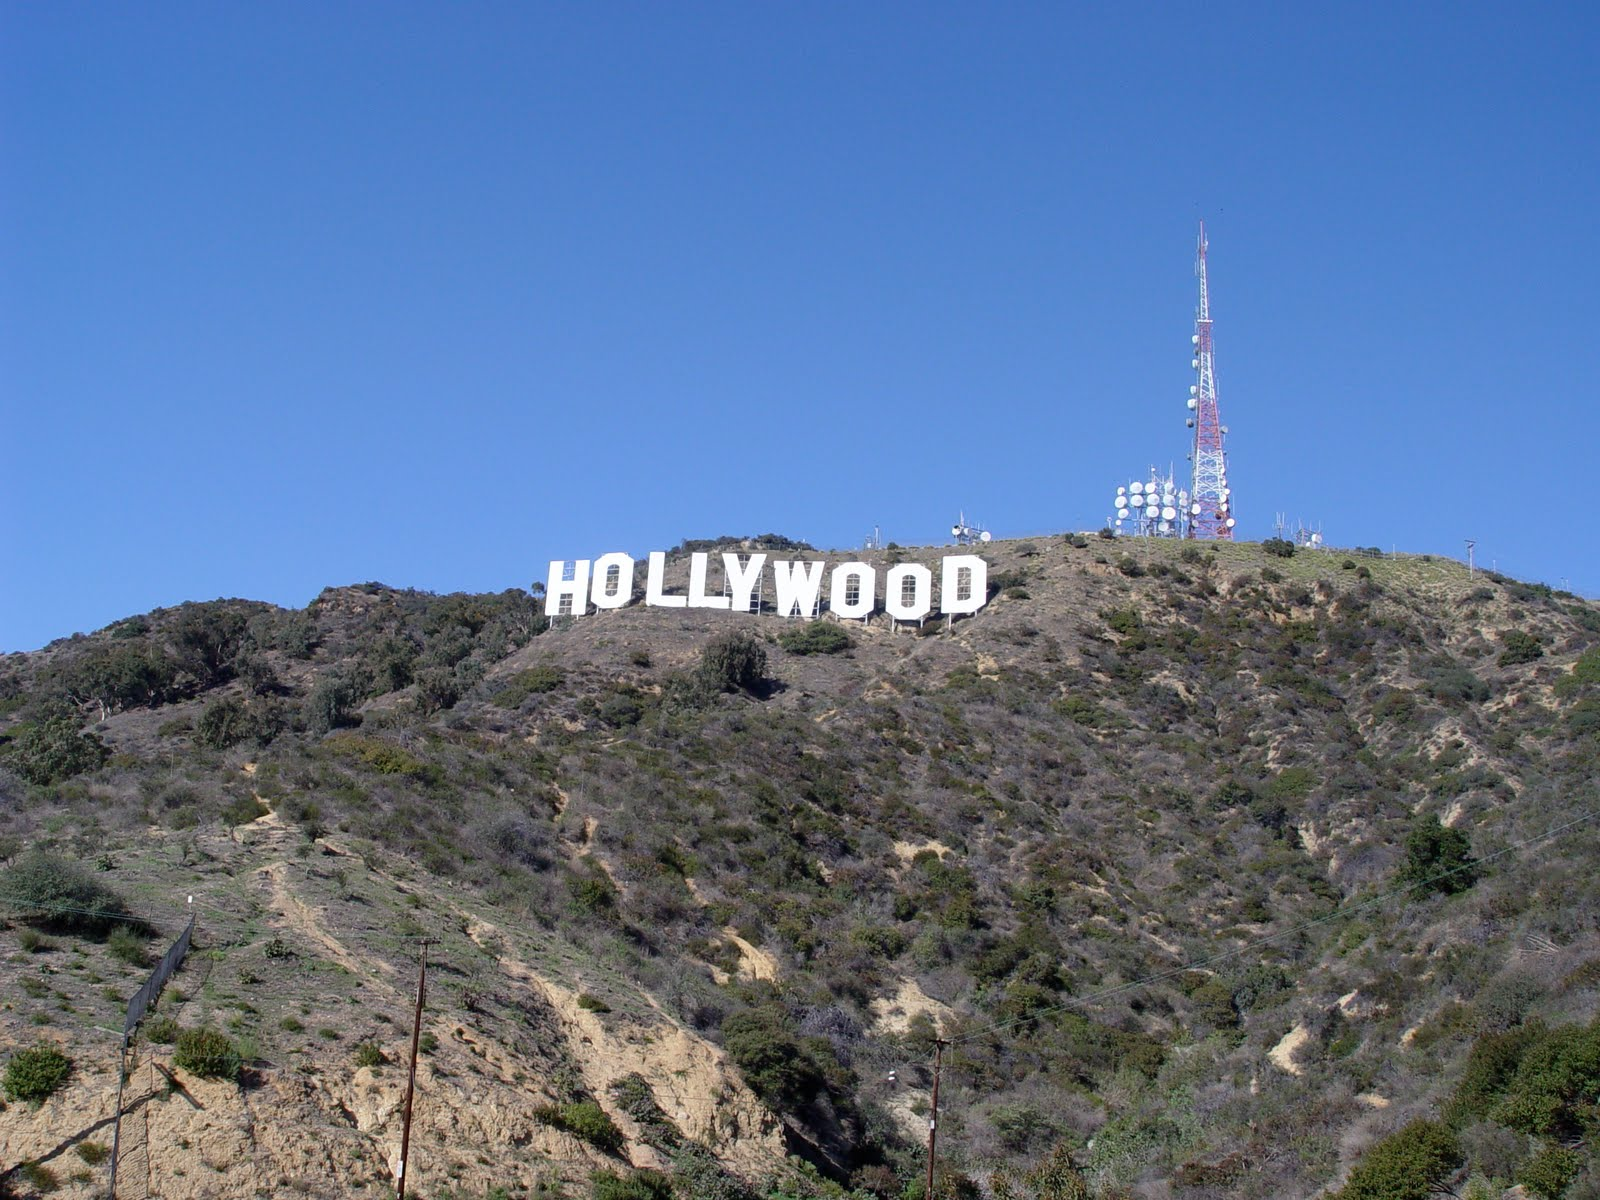 [hollywood]